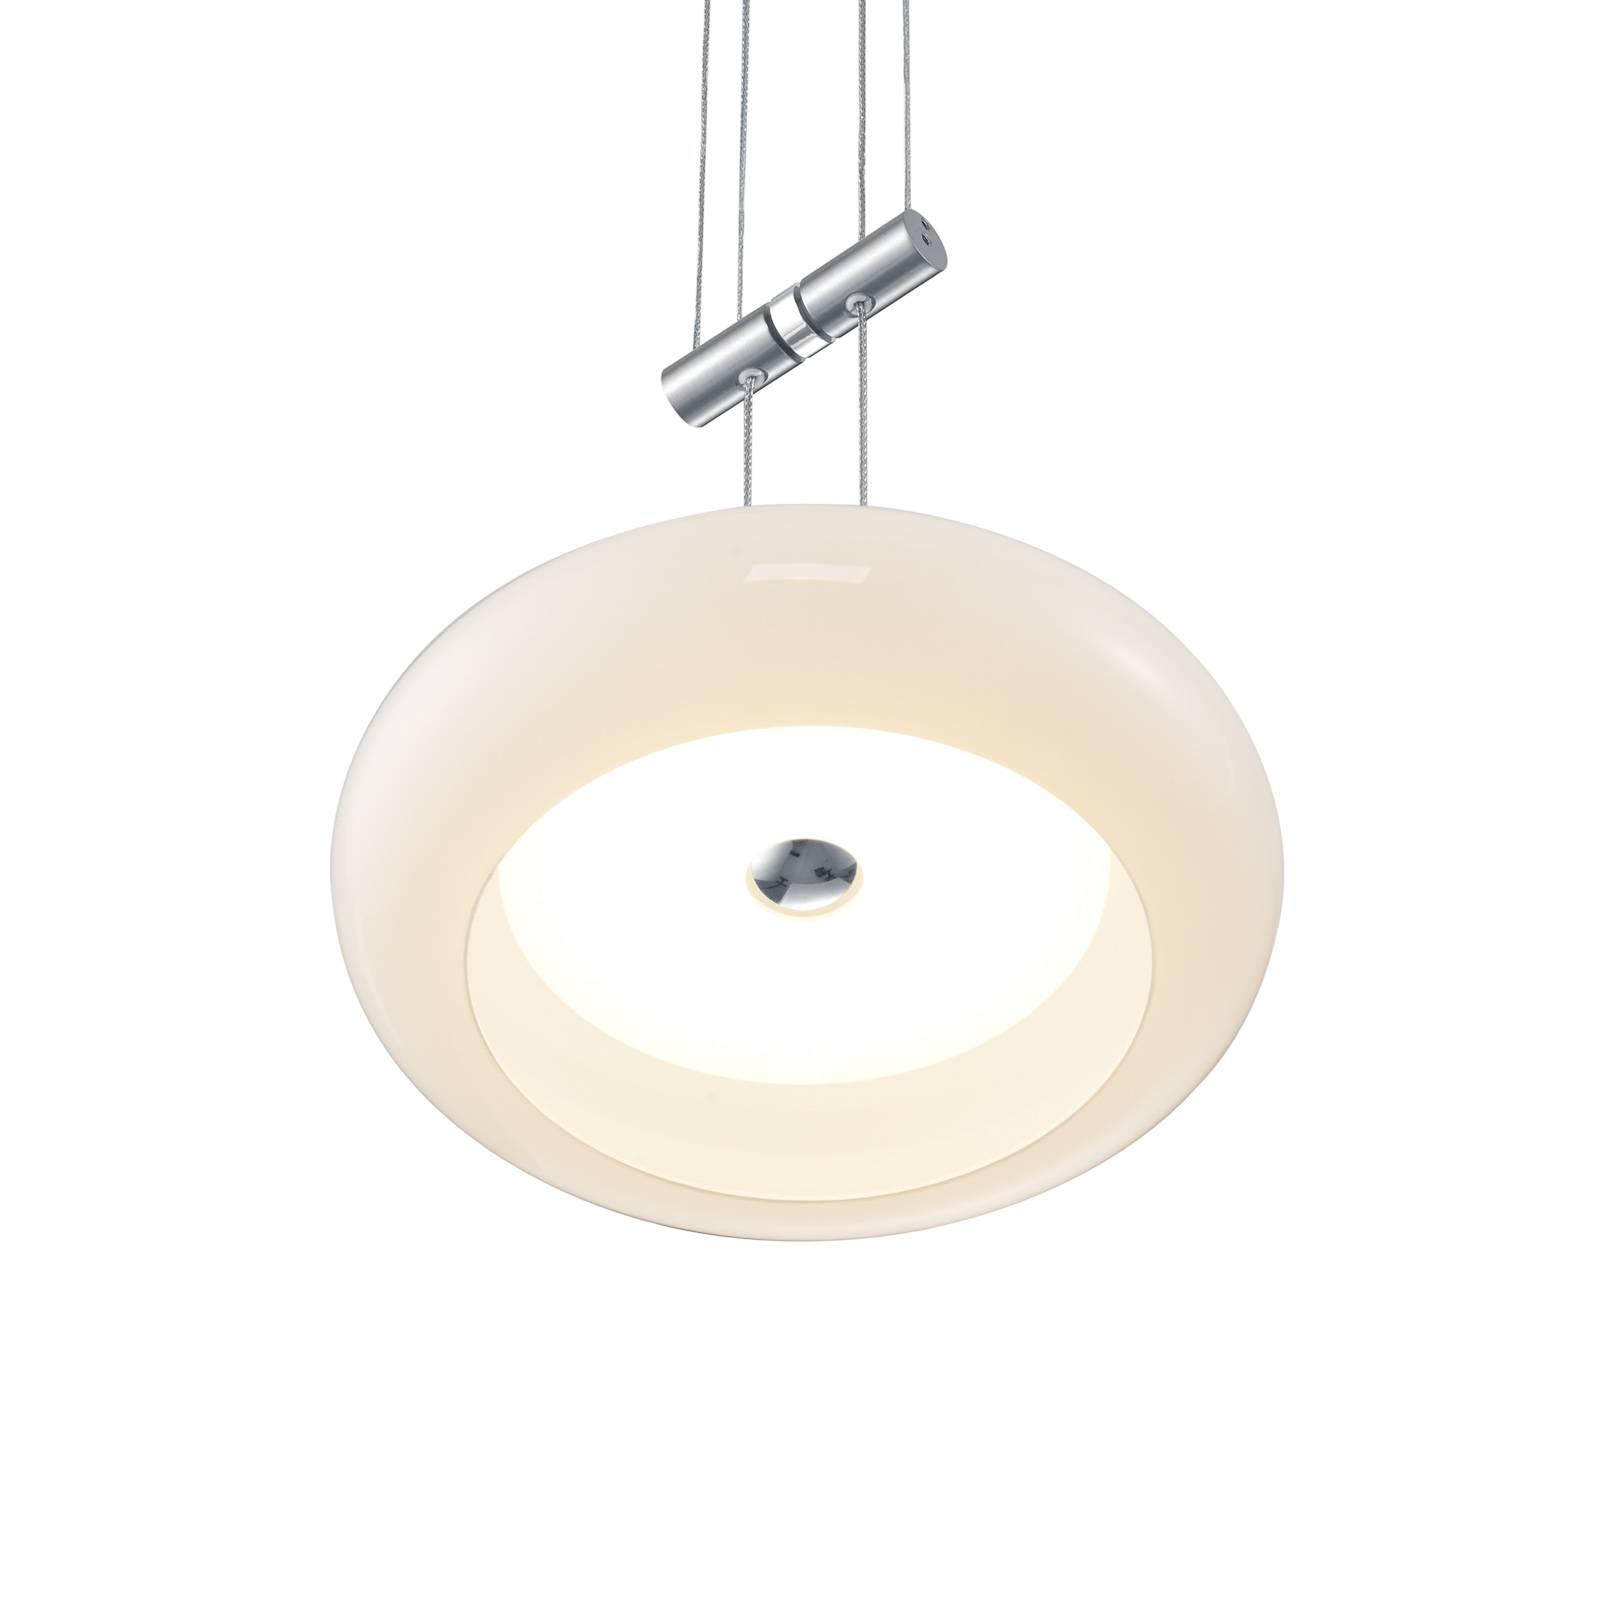 BANKAMP Centa suspension à 2 lampes nickel